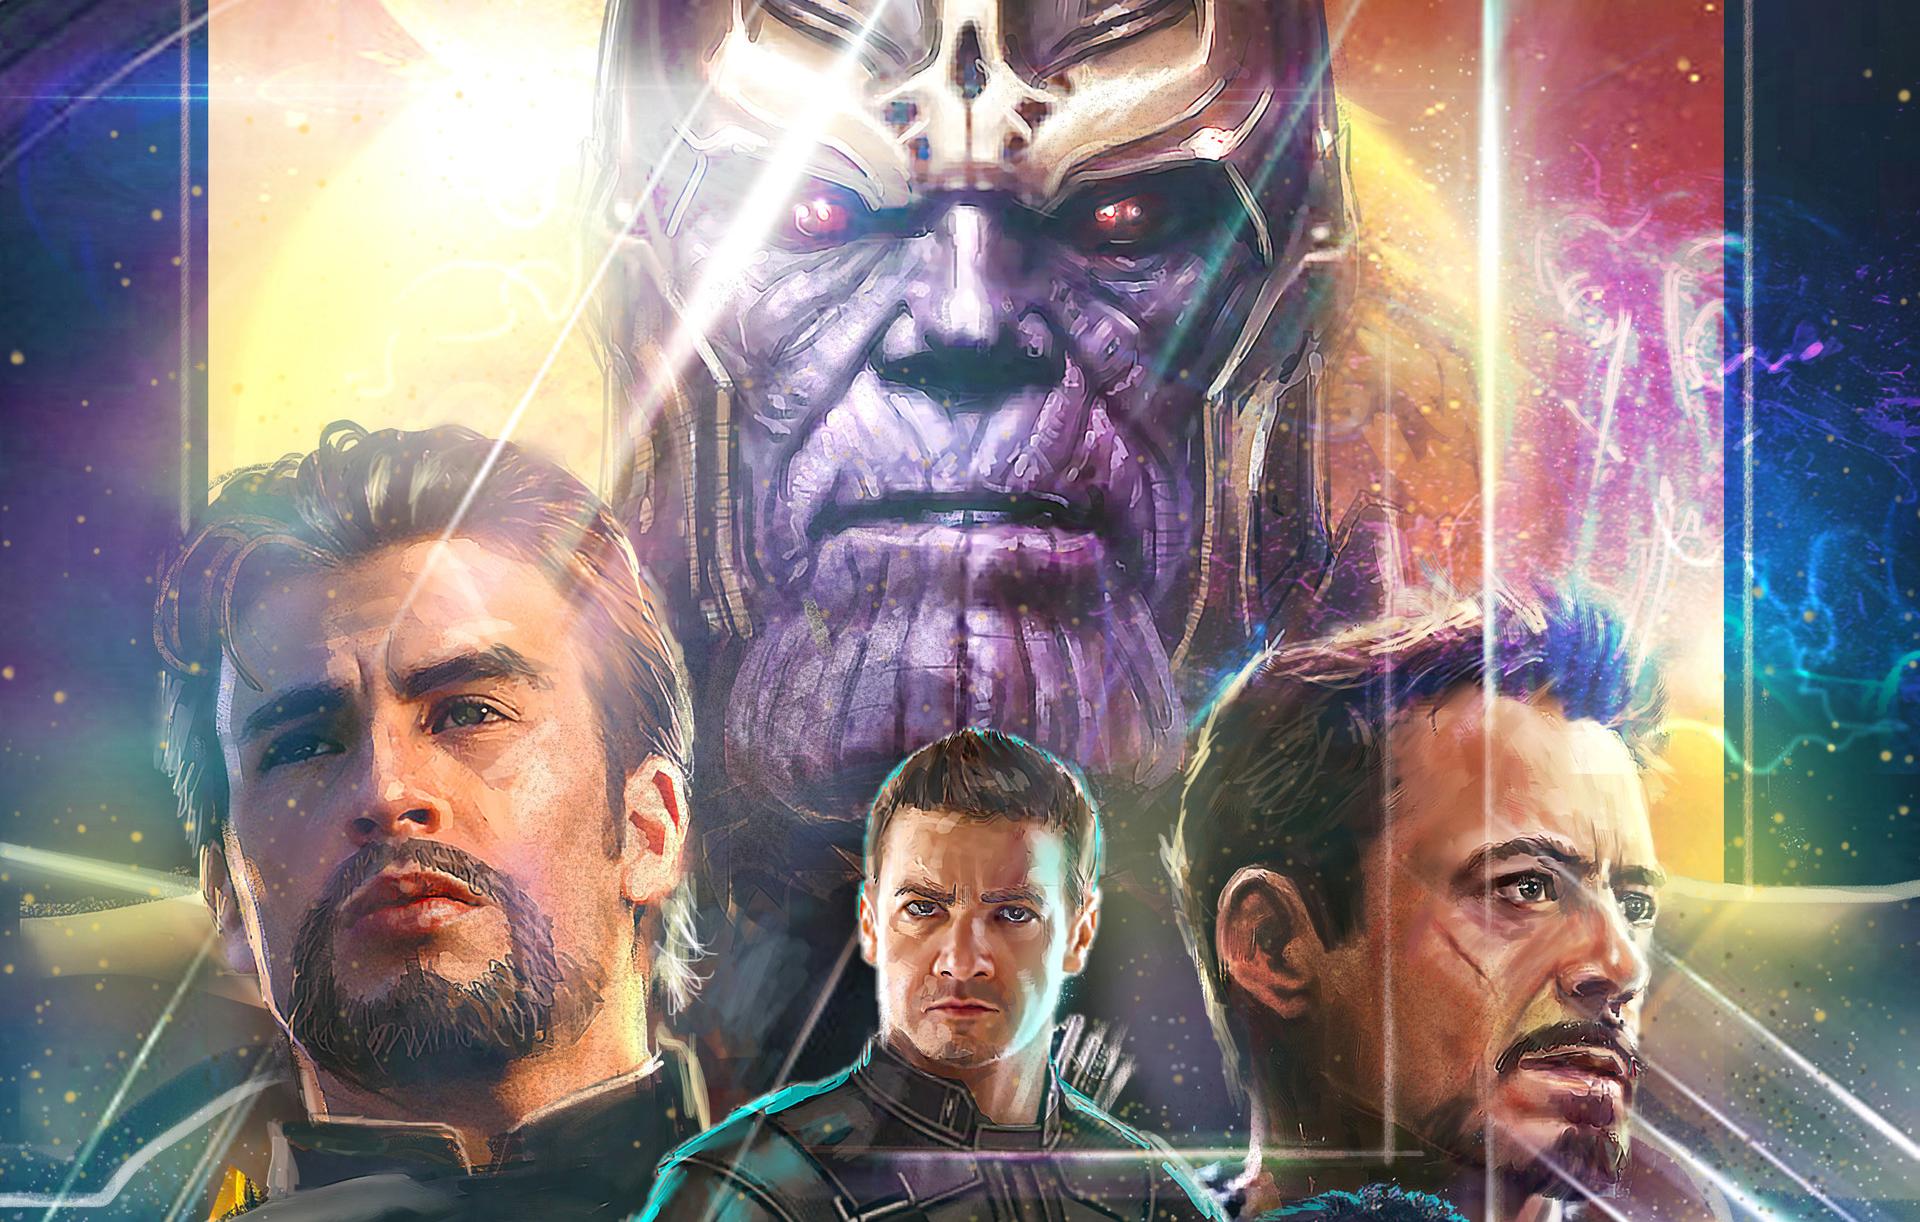 Wallpaper Thanos Avengers Infinity War Artwork Hd: Thanos Iron Man Captain America Hawkeye In Avengers